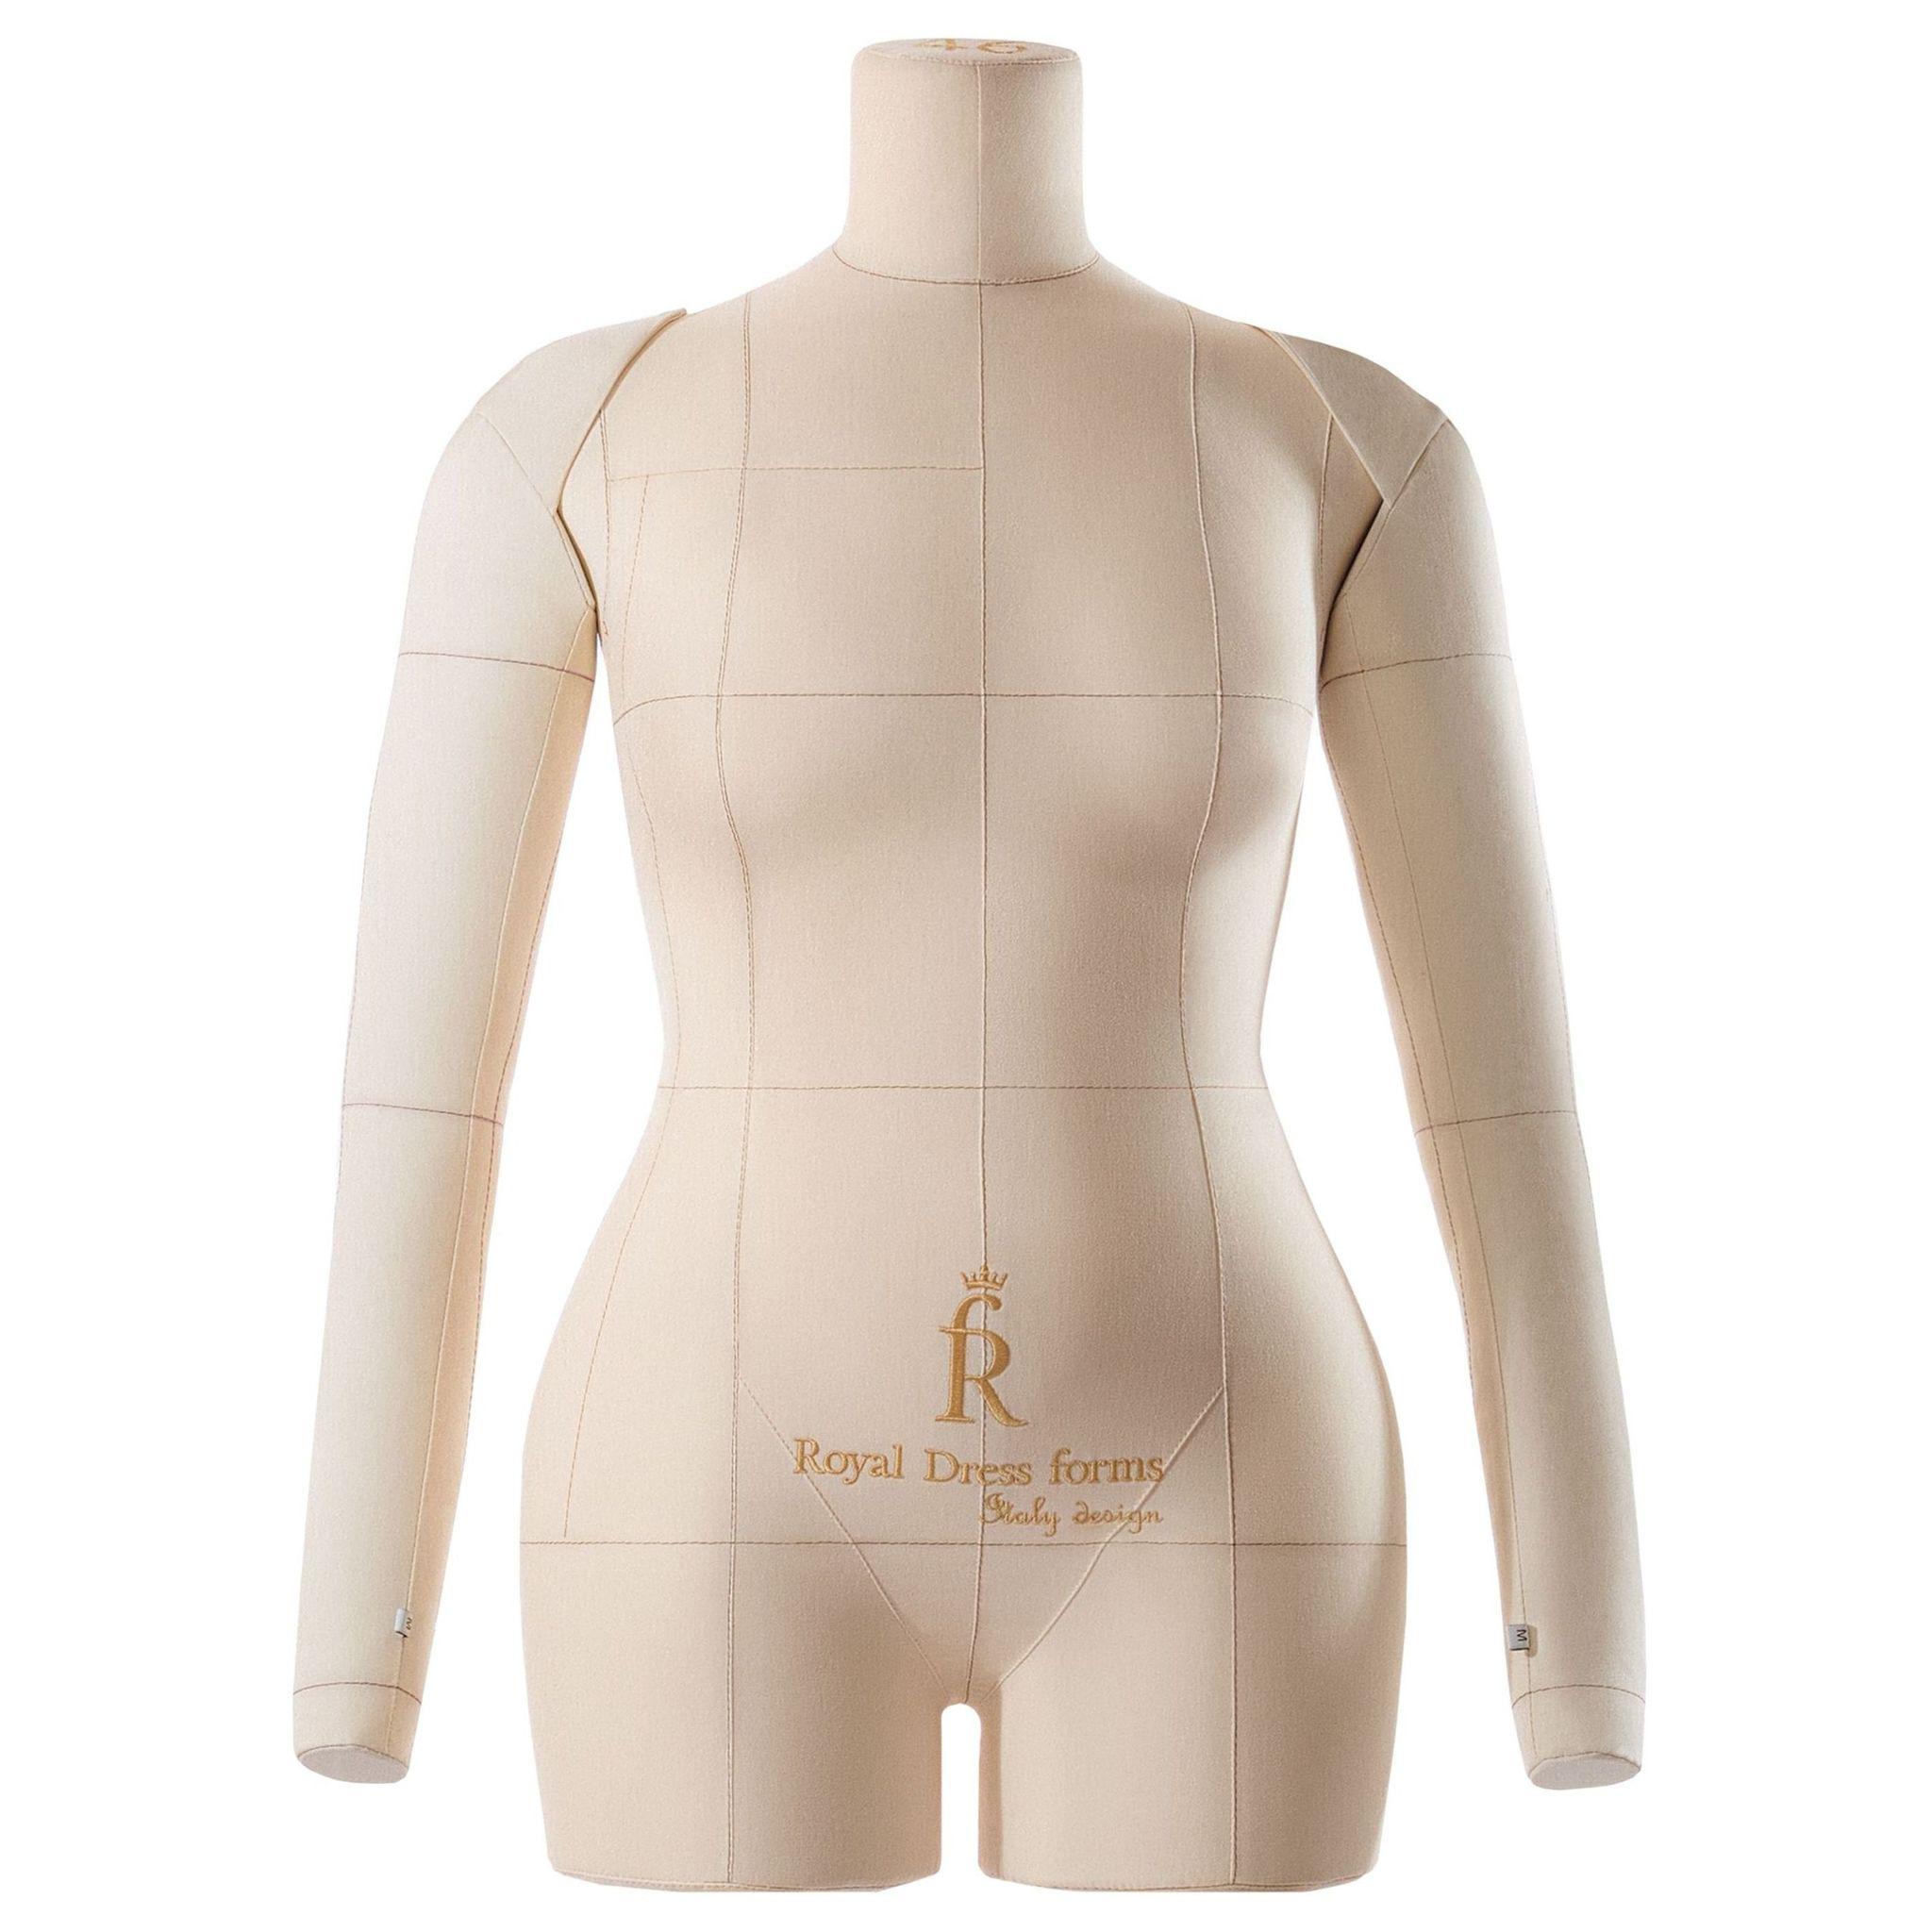 Комплект Comfort: мягкий манекен Monica бежевый 46 с подставкой, Ручки,Сумка-чехол